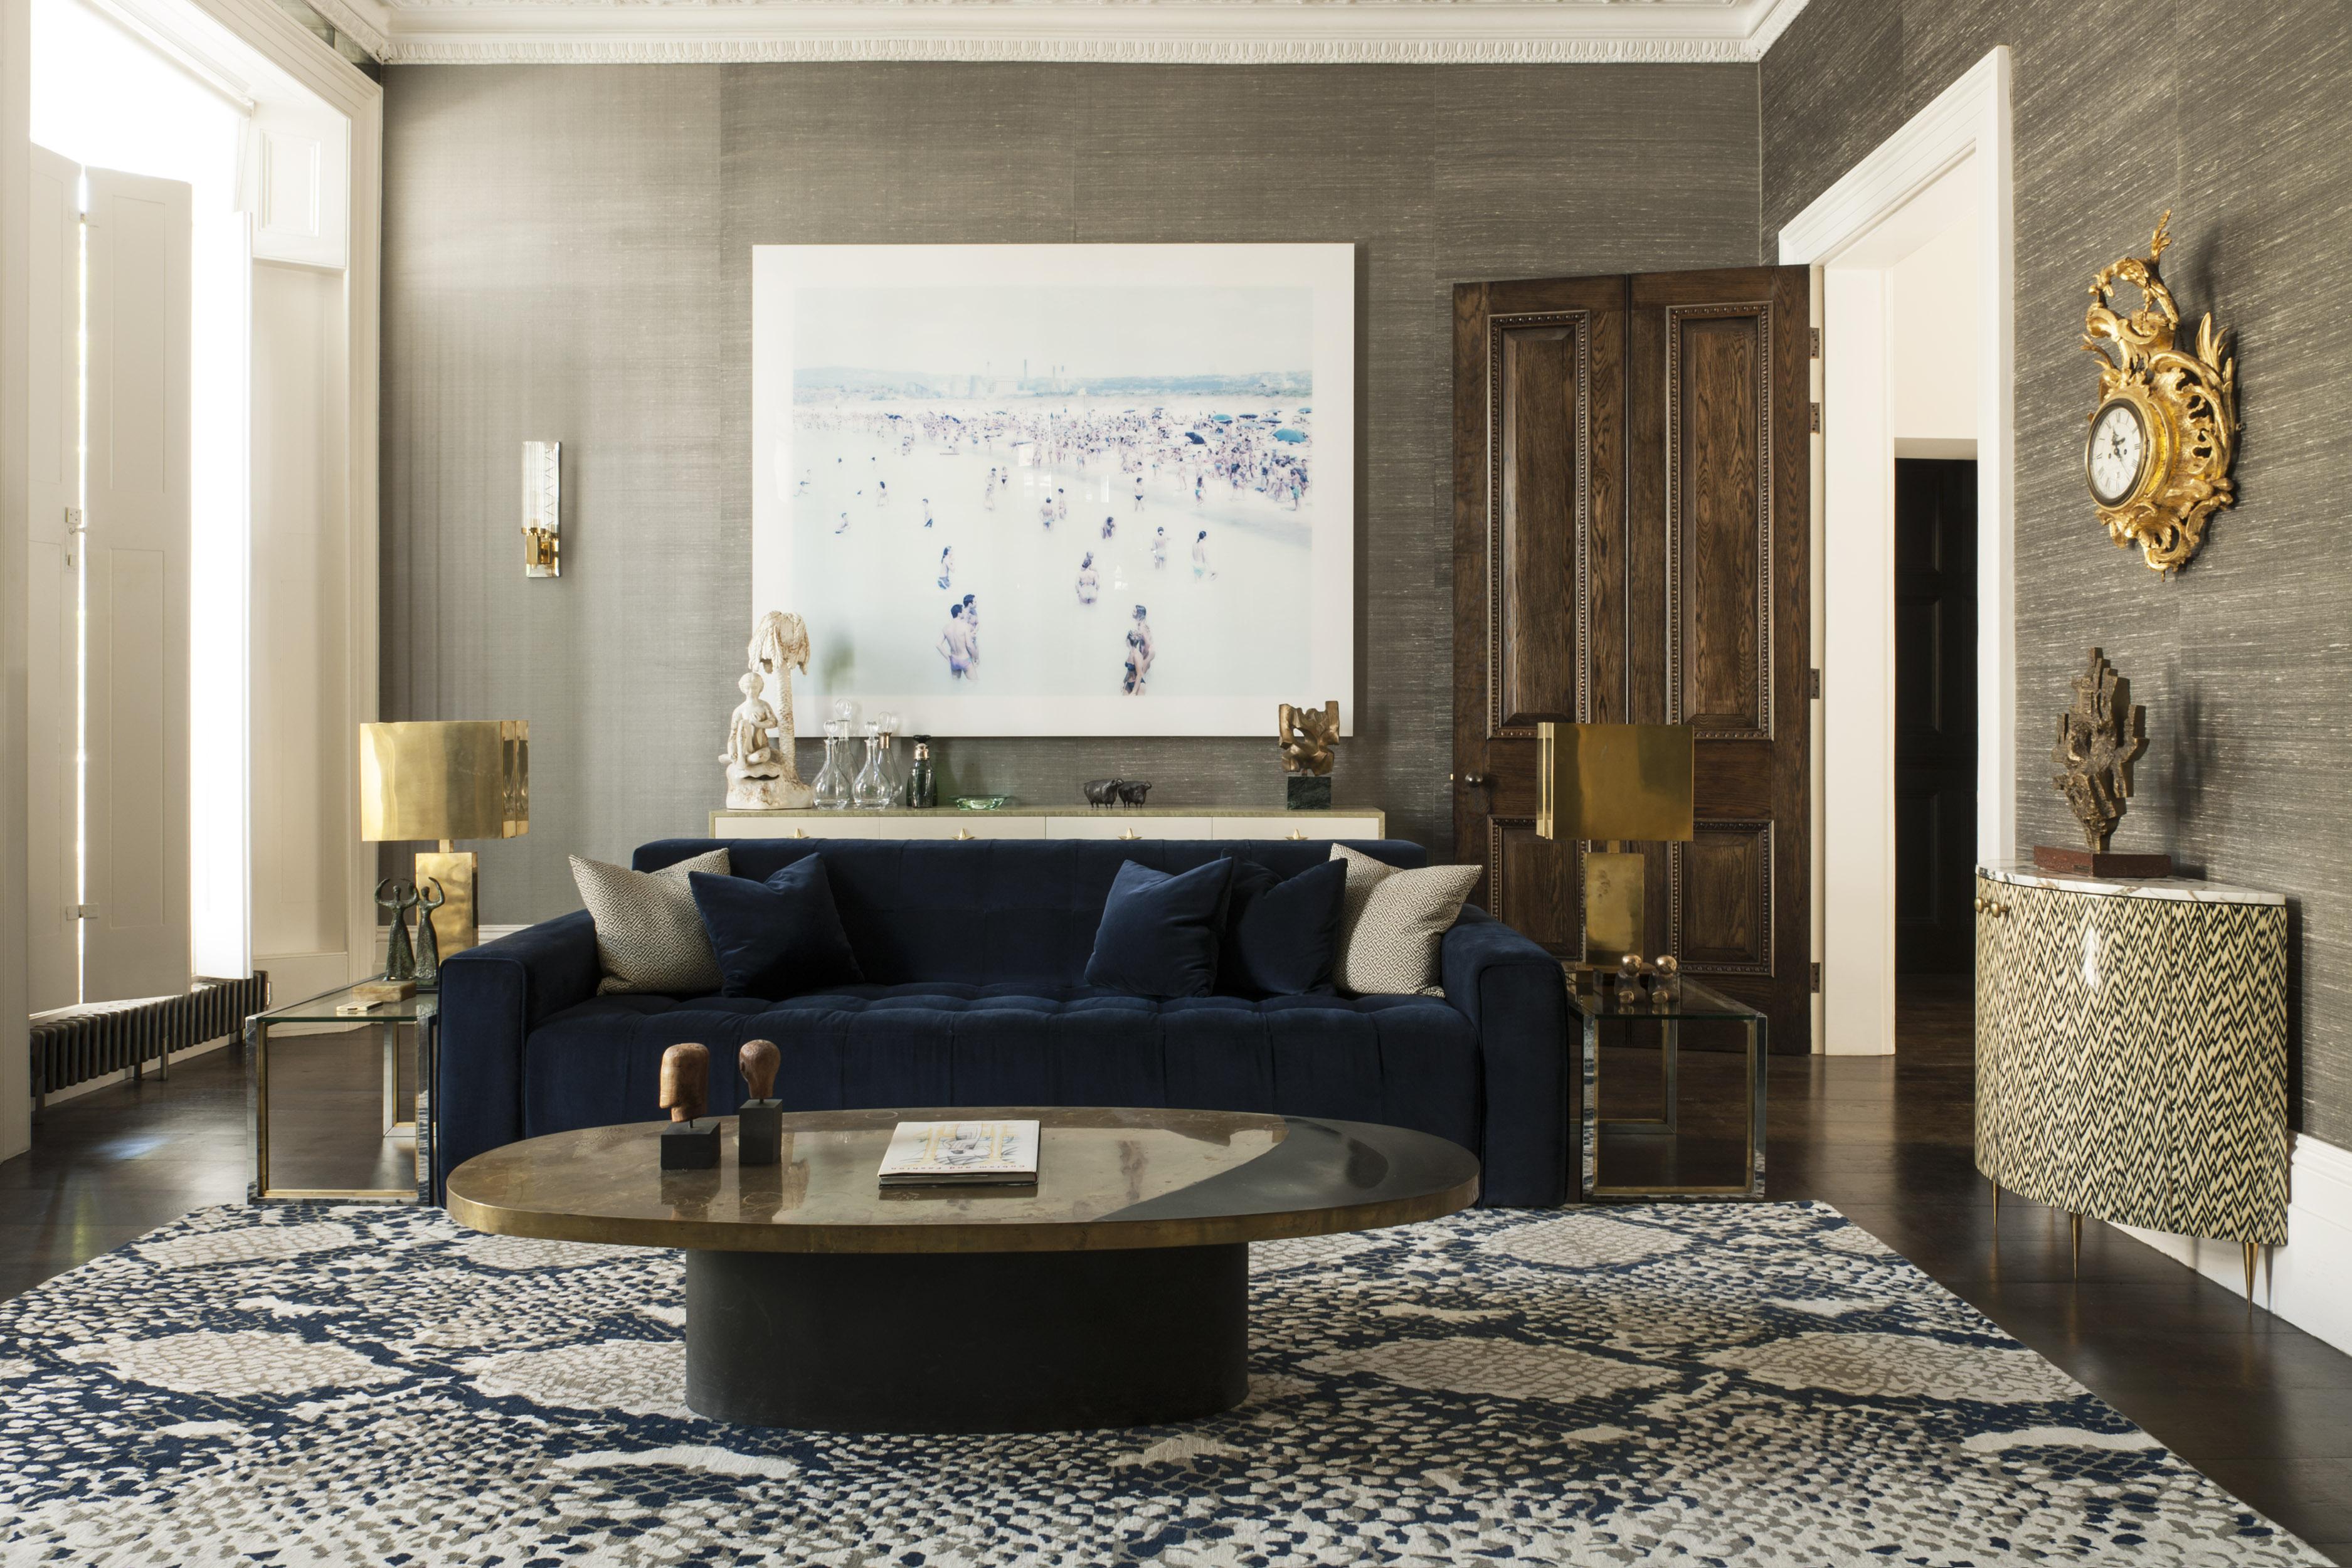 Dress Your Floors with Diane von Furstenberg's Iconic Prints